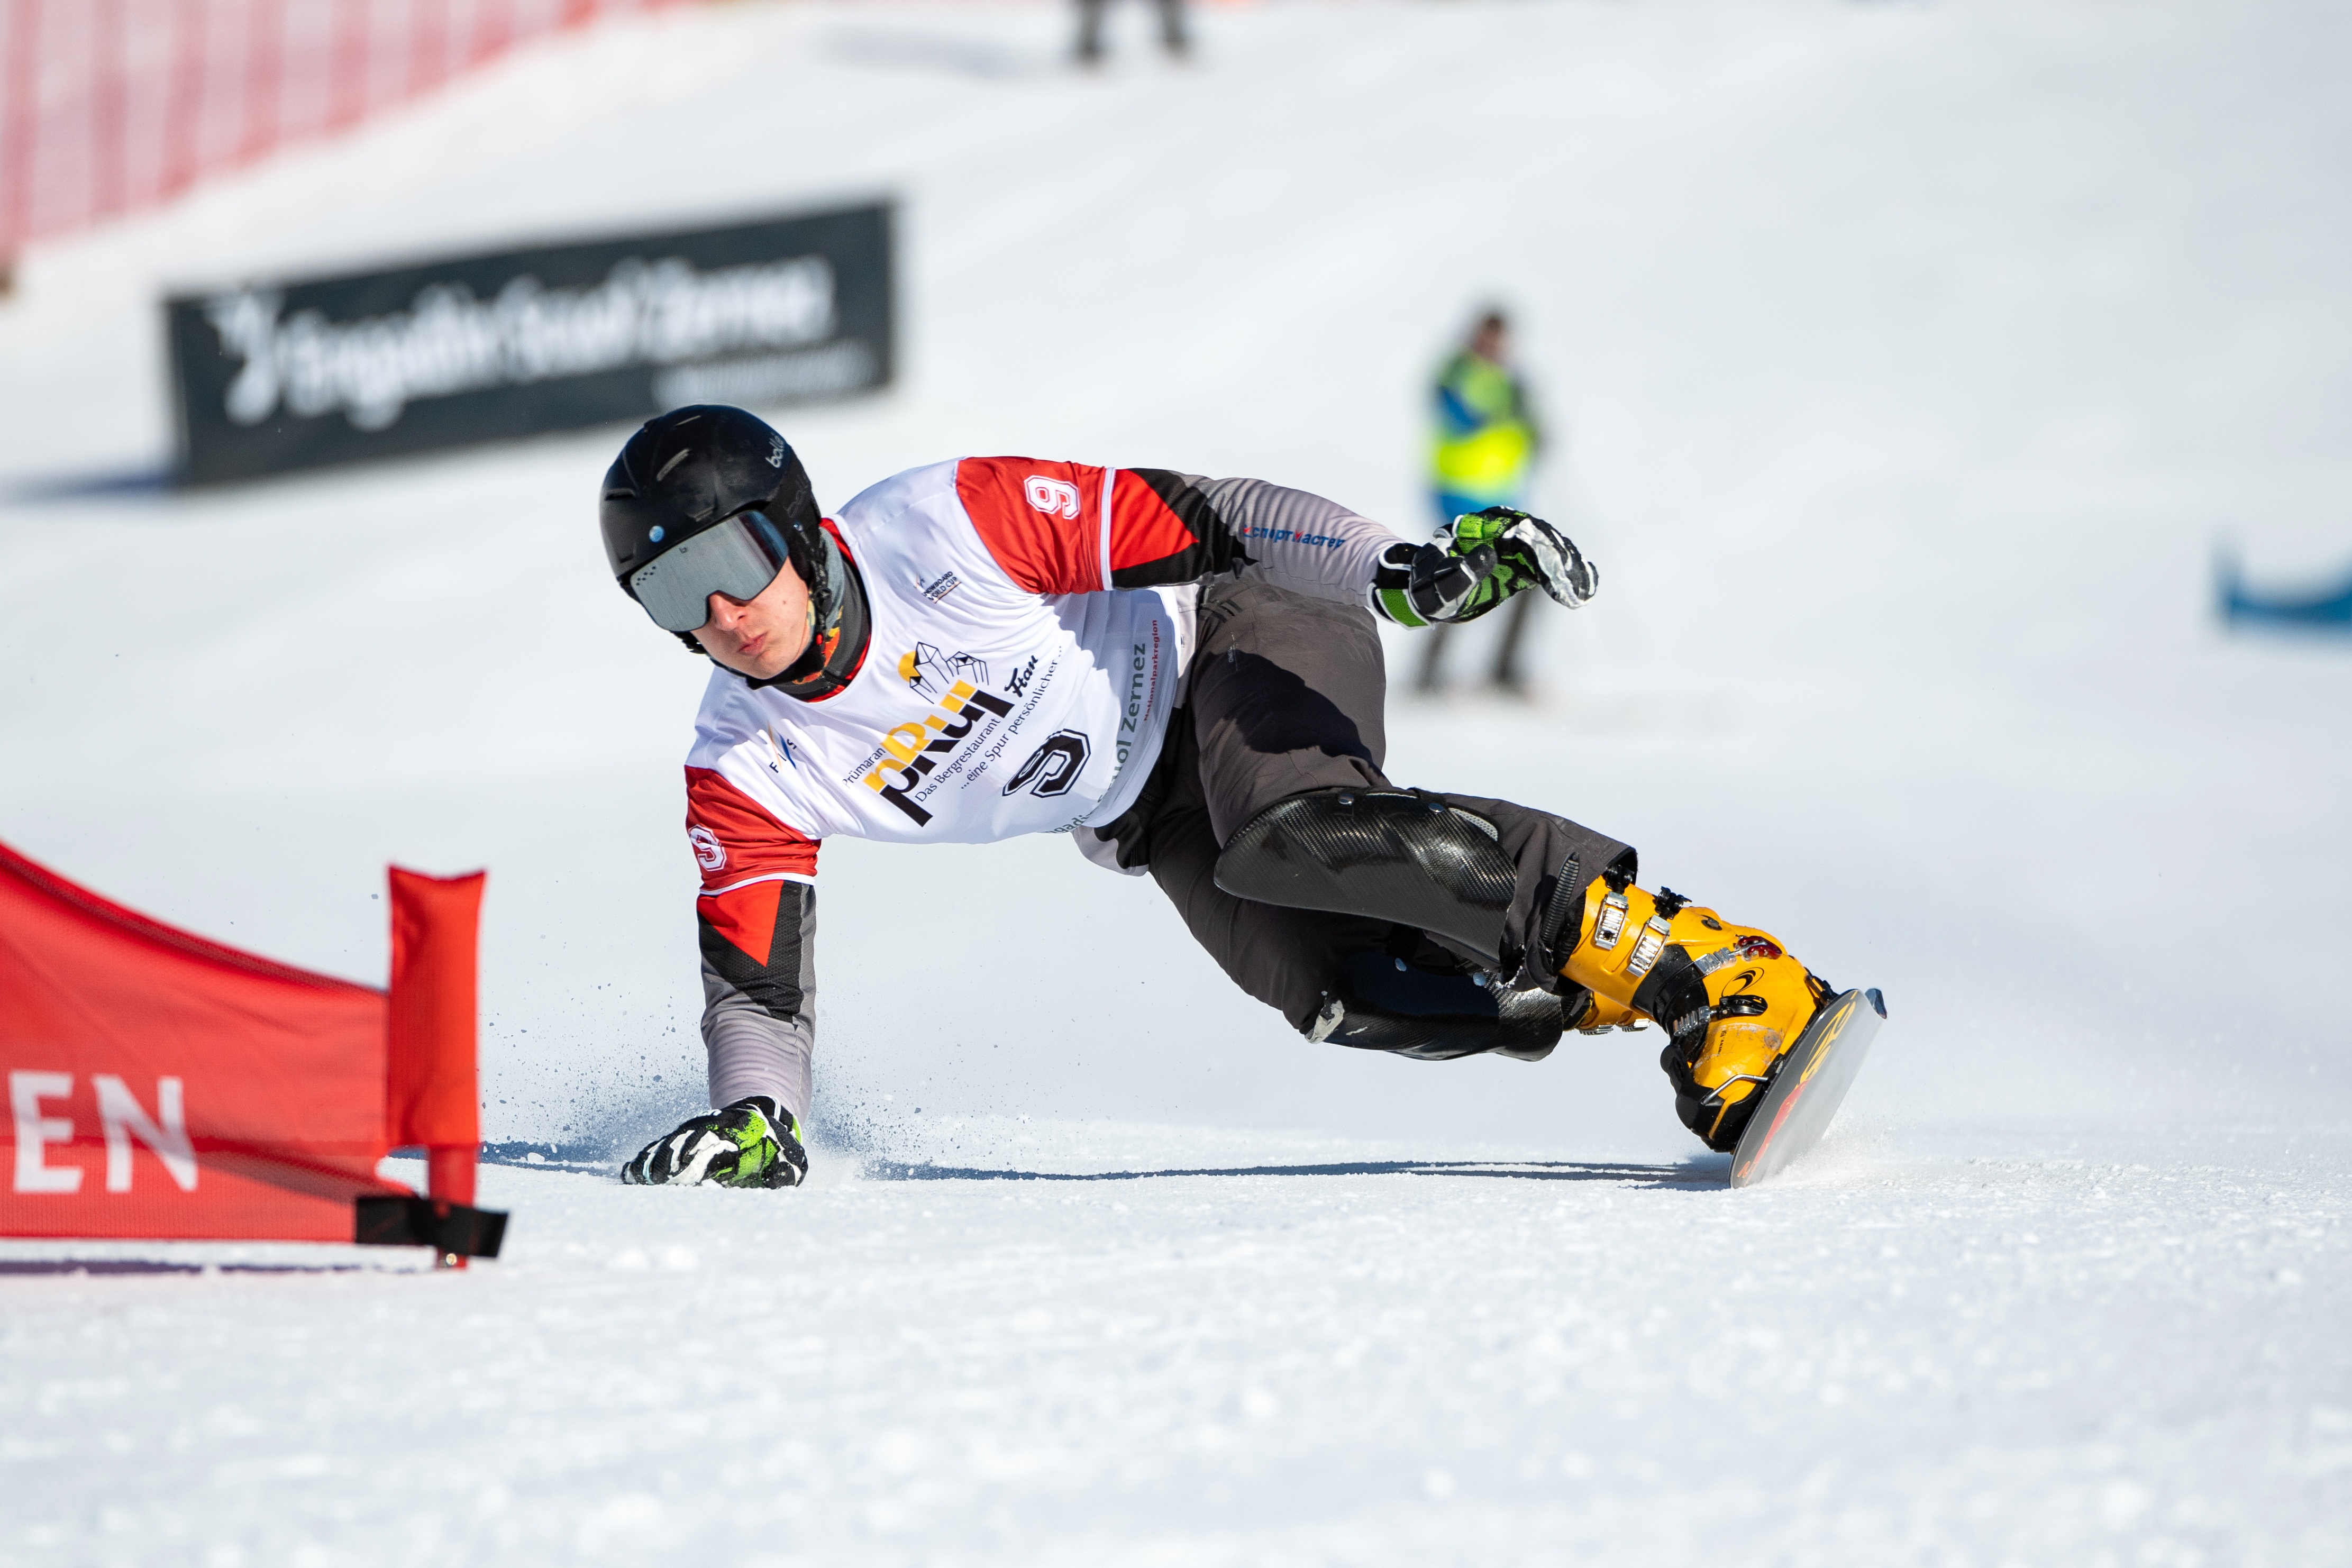 FIS Snowboard World Cup - Scuol SUI - PGS - SOBOLEV Andrey RUS © Miha Matavz/FIS